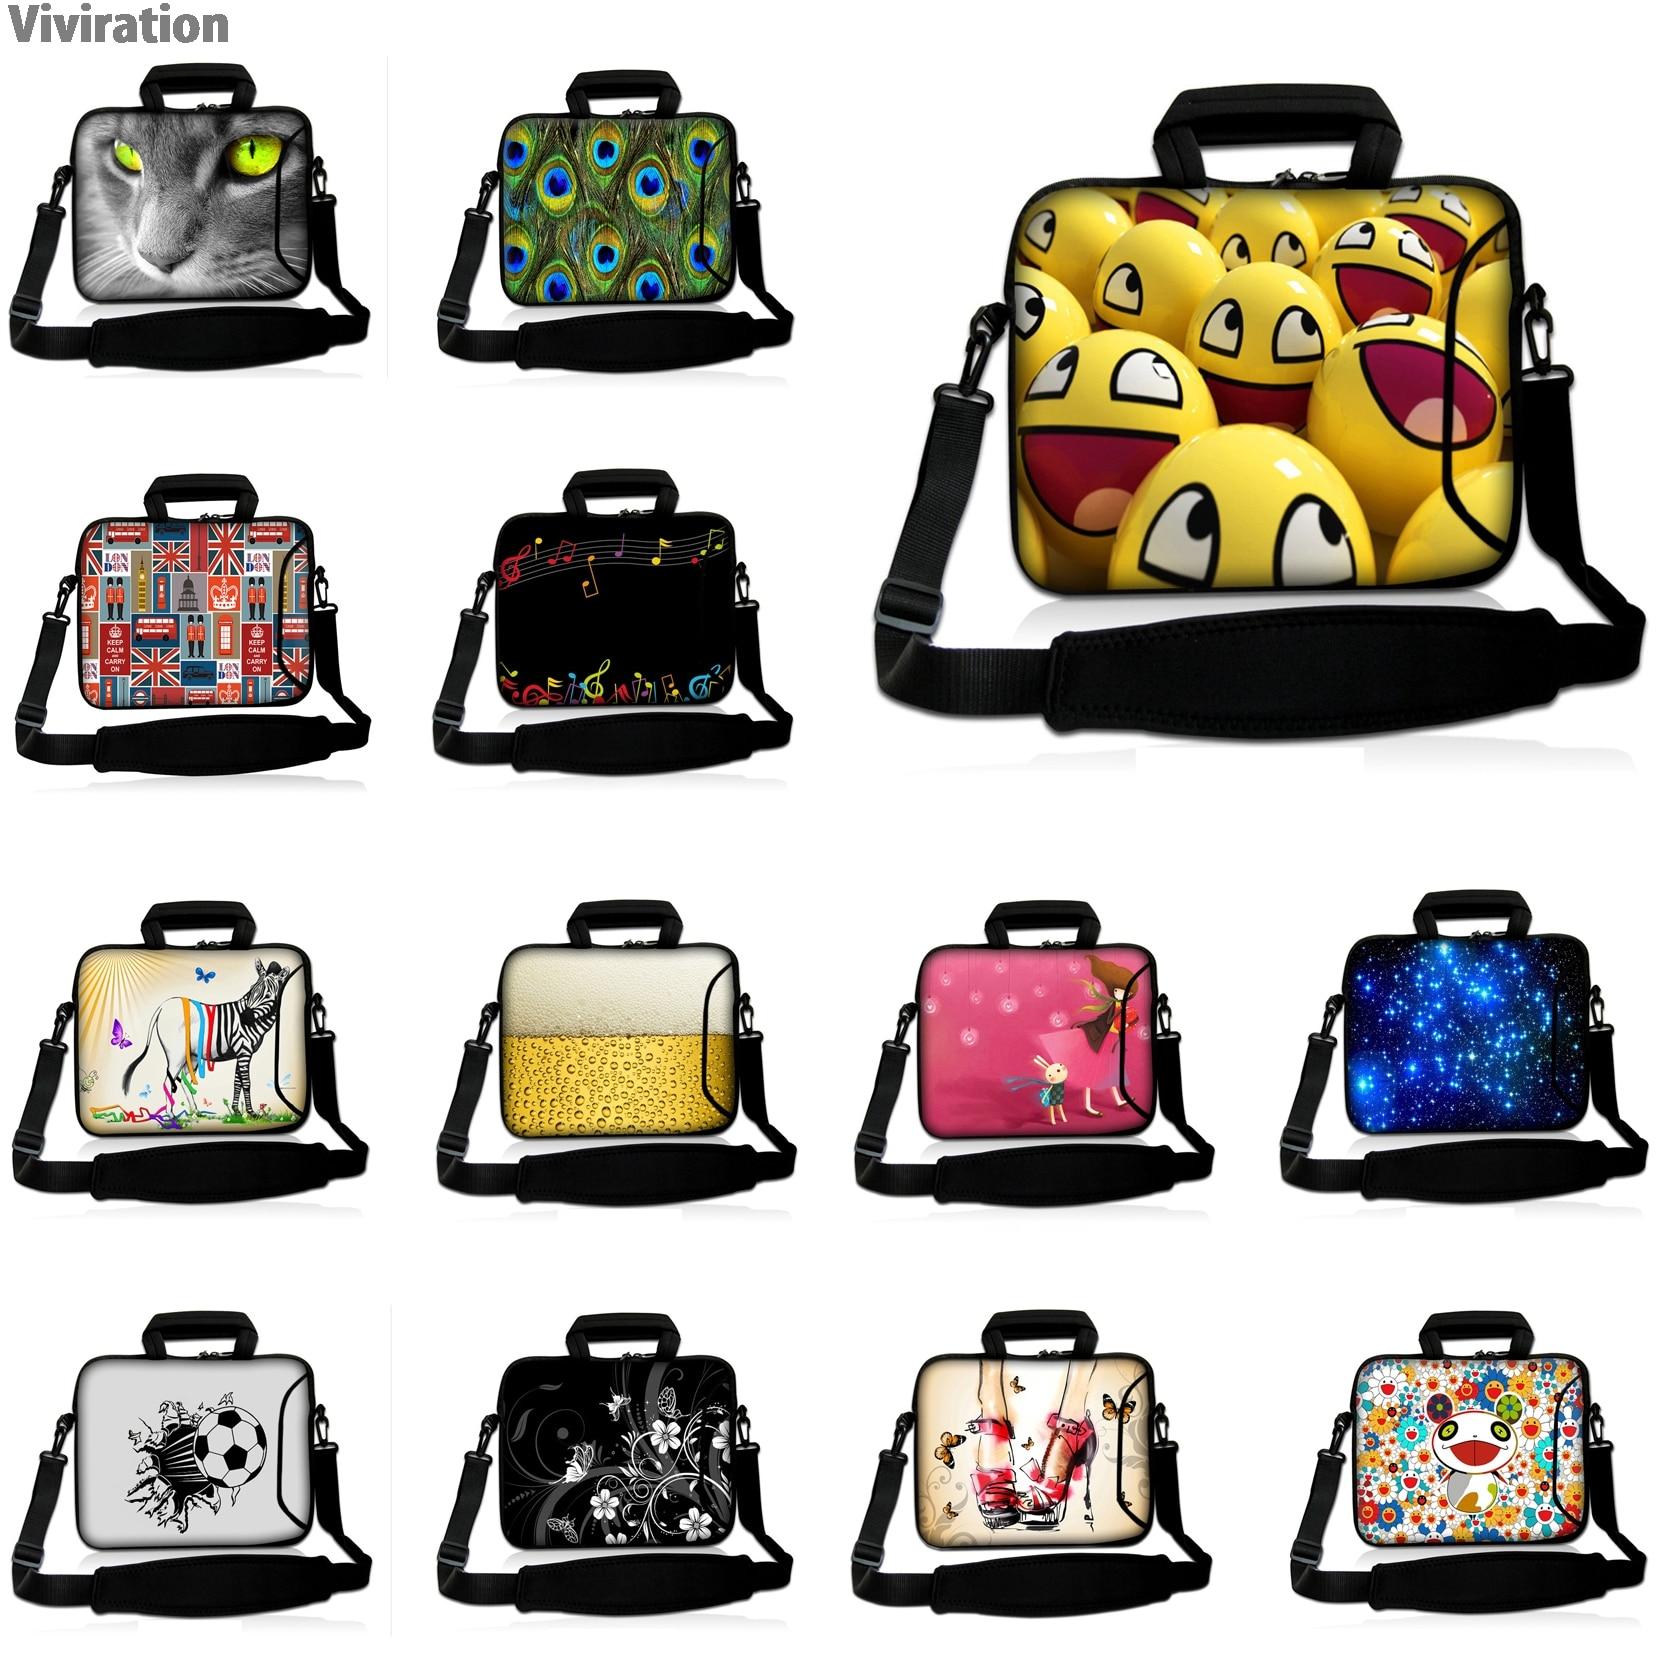 Viviration Waterproof Neoprene Multi-size Colorful Bag Women Mens Handle 10/12/13/14/15/17 Laptop Notebook Messenger Case +Strap